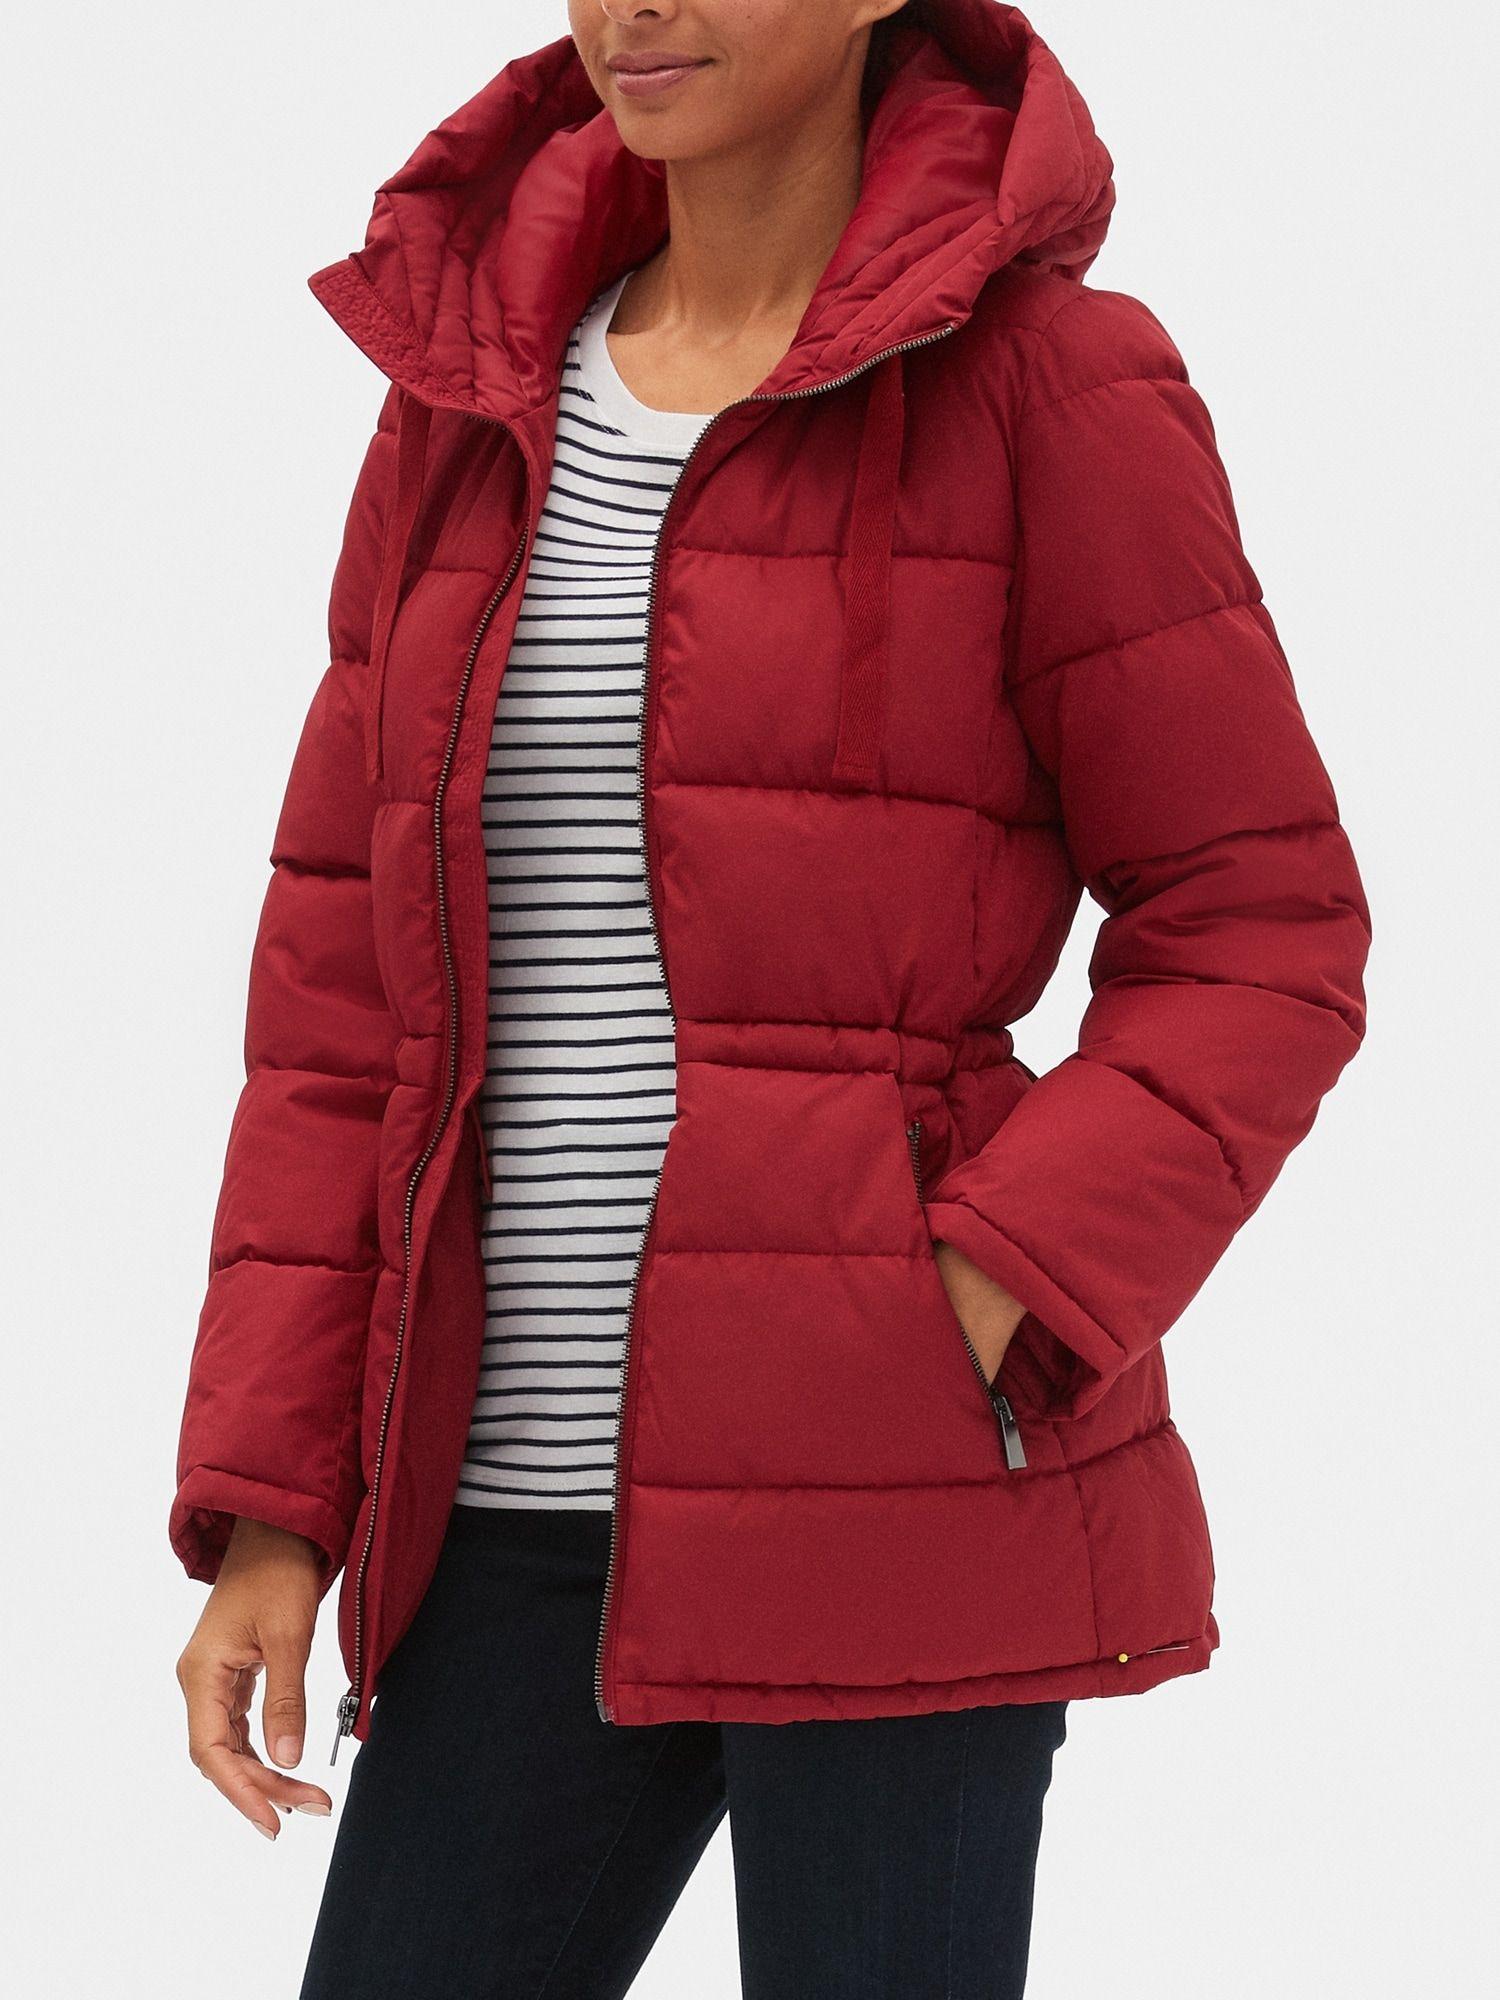 Hooded Puffer Jacket Gap Factory Giftryapp Jackets Outerwear Women Outerwear [ 2000 x 1500 Pixel ]